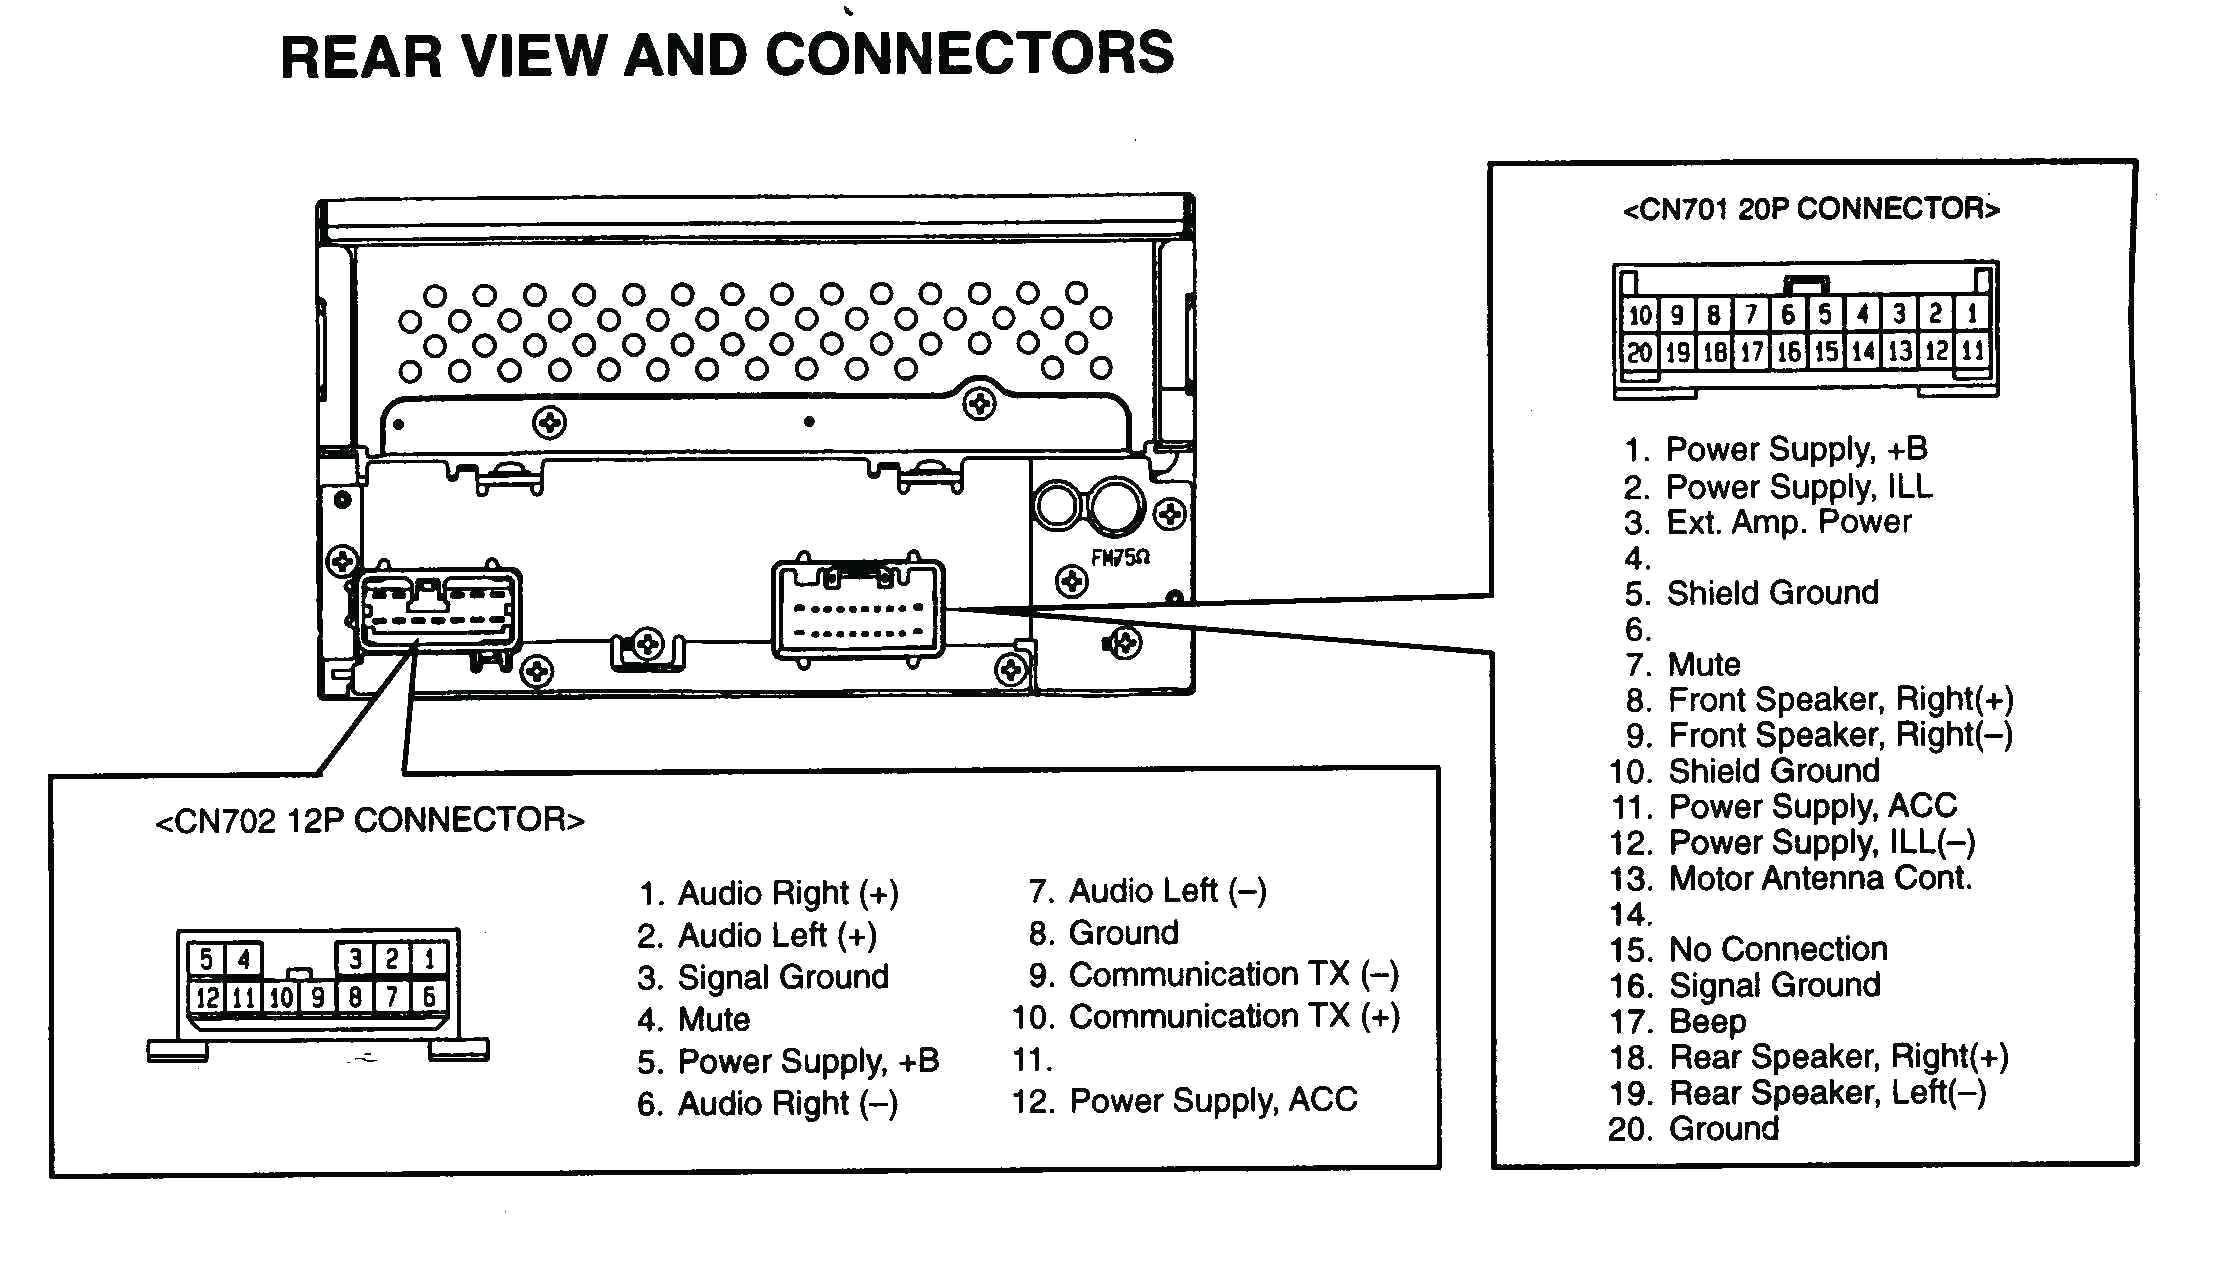 2004 mazda 3 wiring diagrams wiring diagram toolbox 2008 mazda 3 headlight wiring diagram mazda 3 headlight wiring diagram